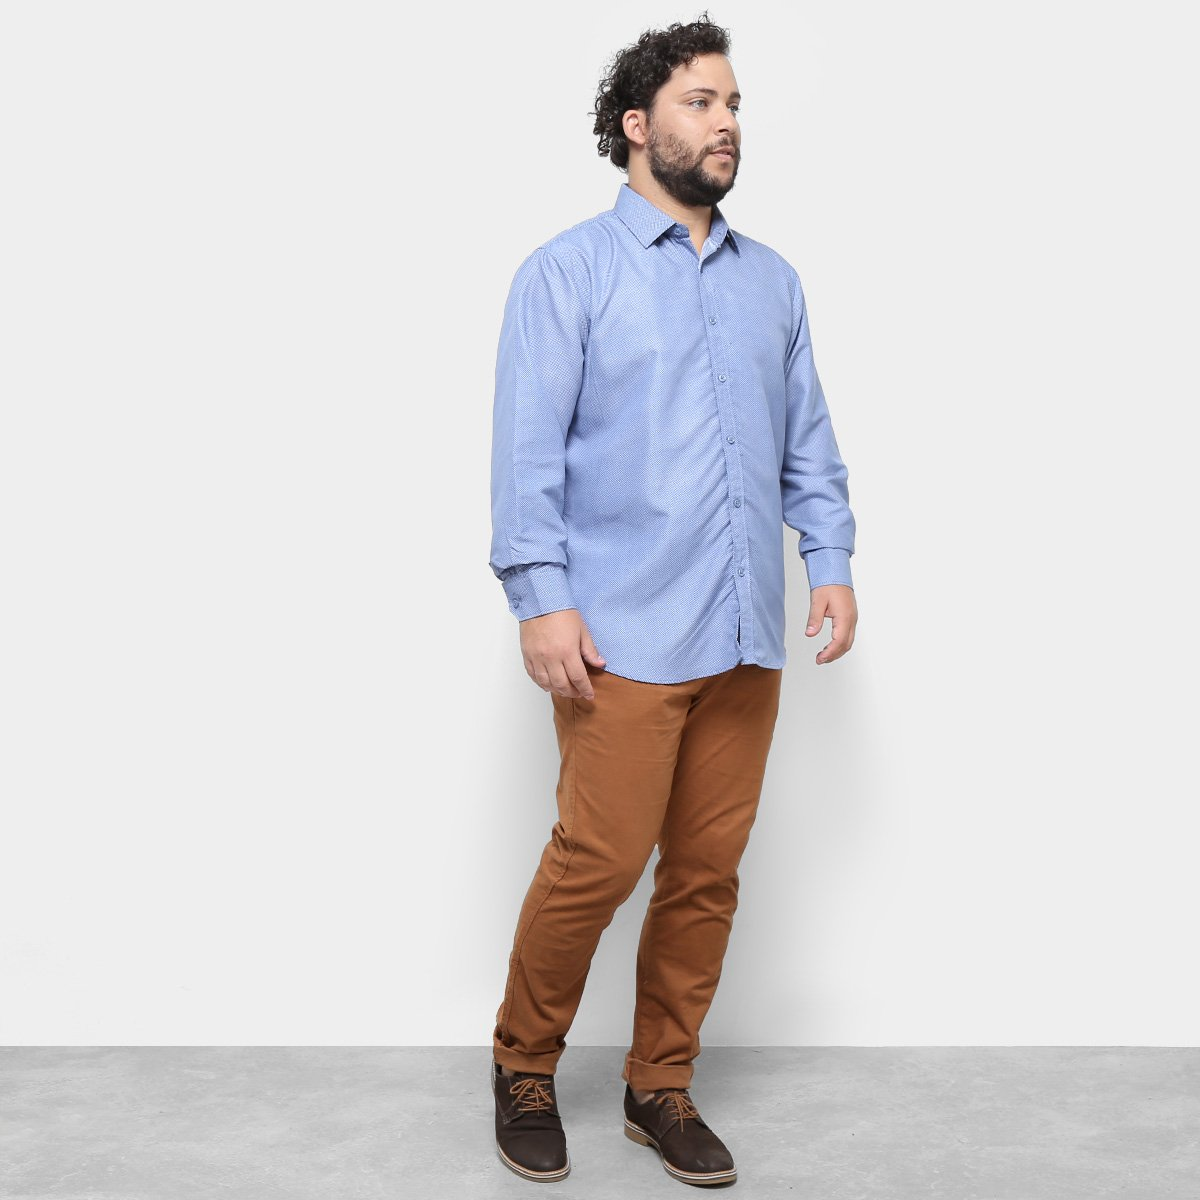 87b1a4652a01e2 Camisa Delkor Manga Longa Plus Size Masculina - Tam: G3 - Shopping ...